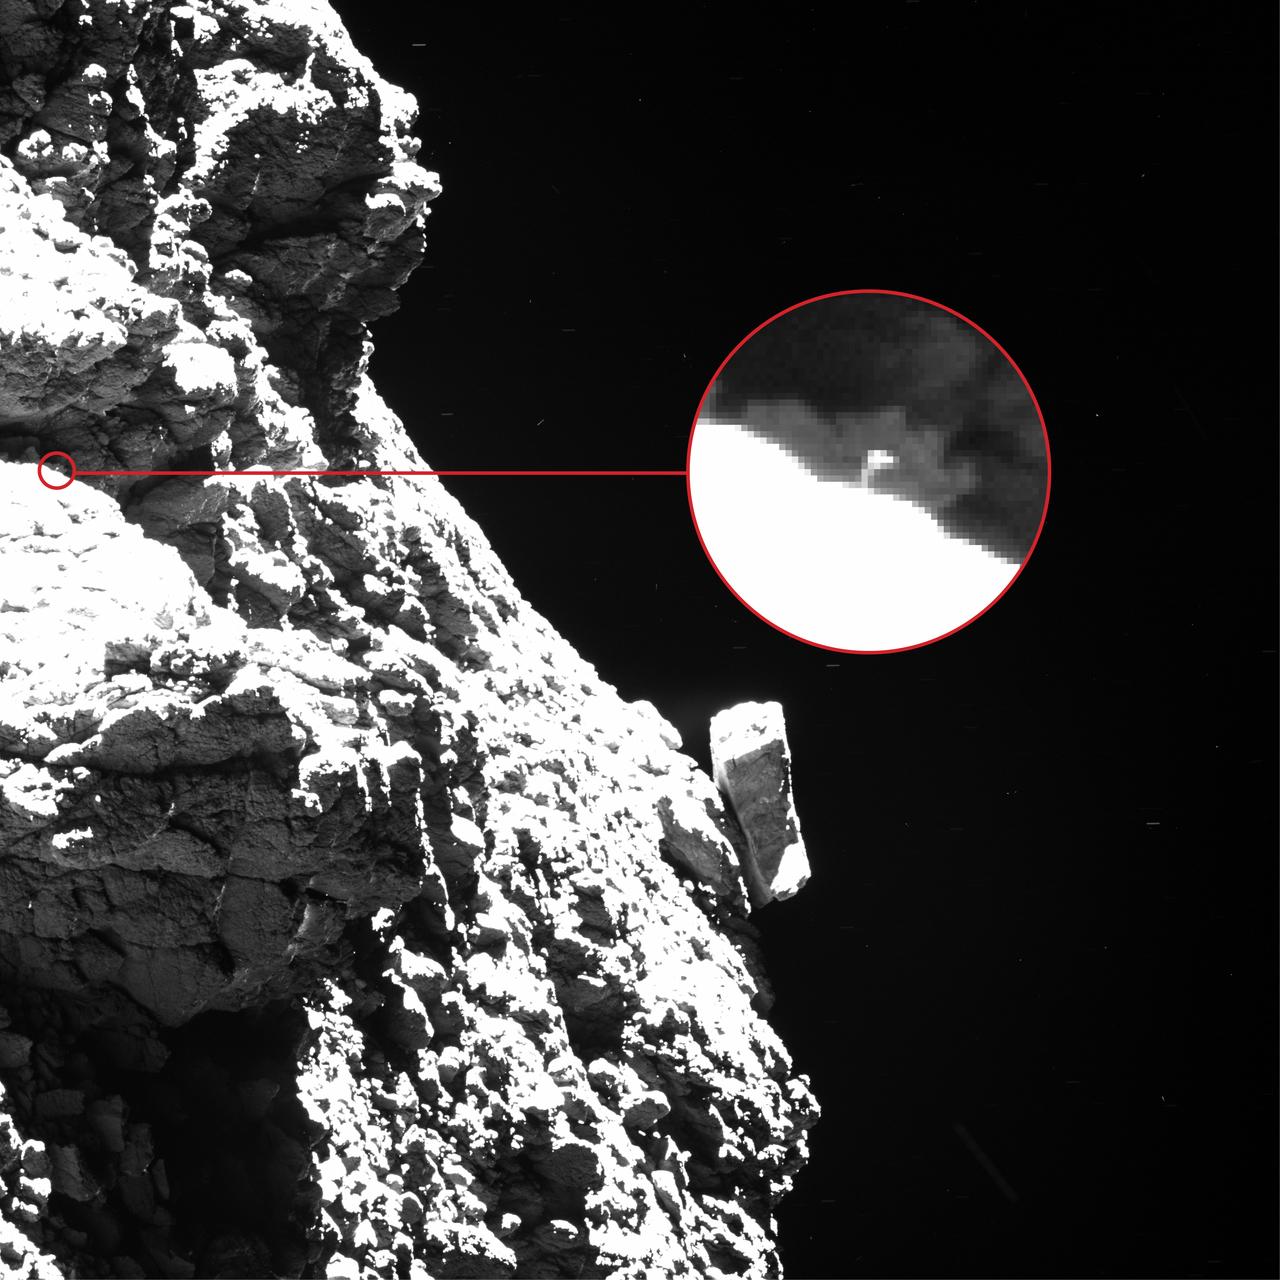 1567213884856-Rosetta_OSIRIS_NAC_20160830_Philae-leg_1280.jpg